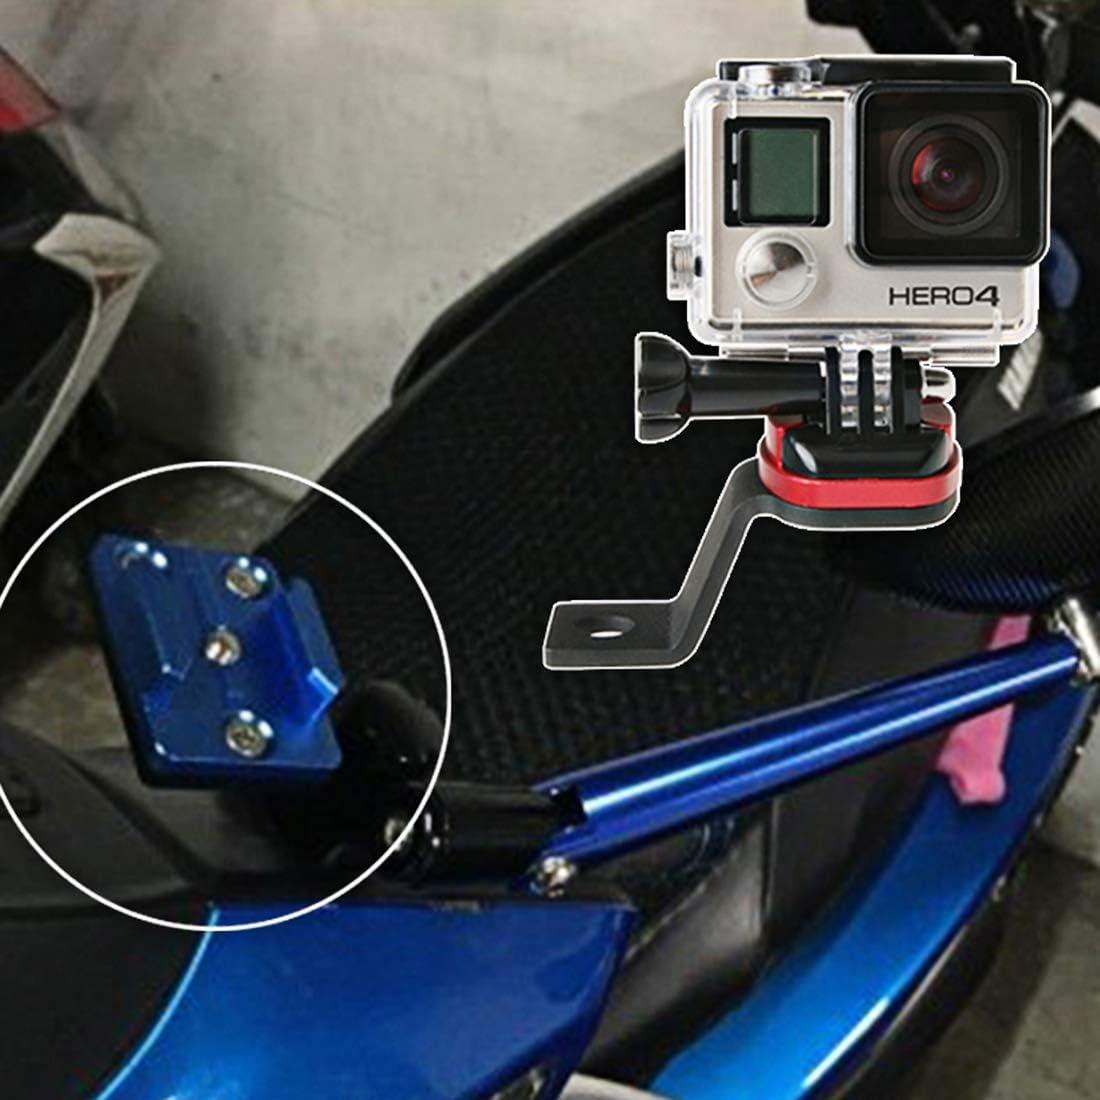 SJCAM Camera HUIFANGBU Motorcycle Rearview Mirror CNC Aluminum Alloy Stent Fixed Bracket Holder for GoPro New Hero //HERO6 // 5//5 Session //4//3+ //3//2 //1 Black Blue etc Xiaomi Xiaoyi Gold